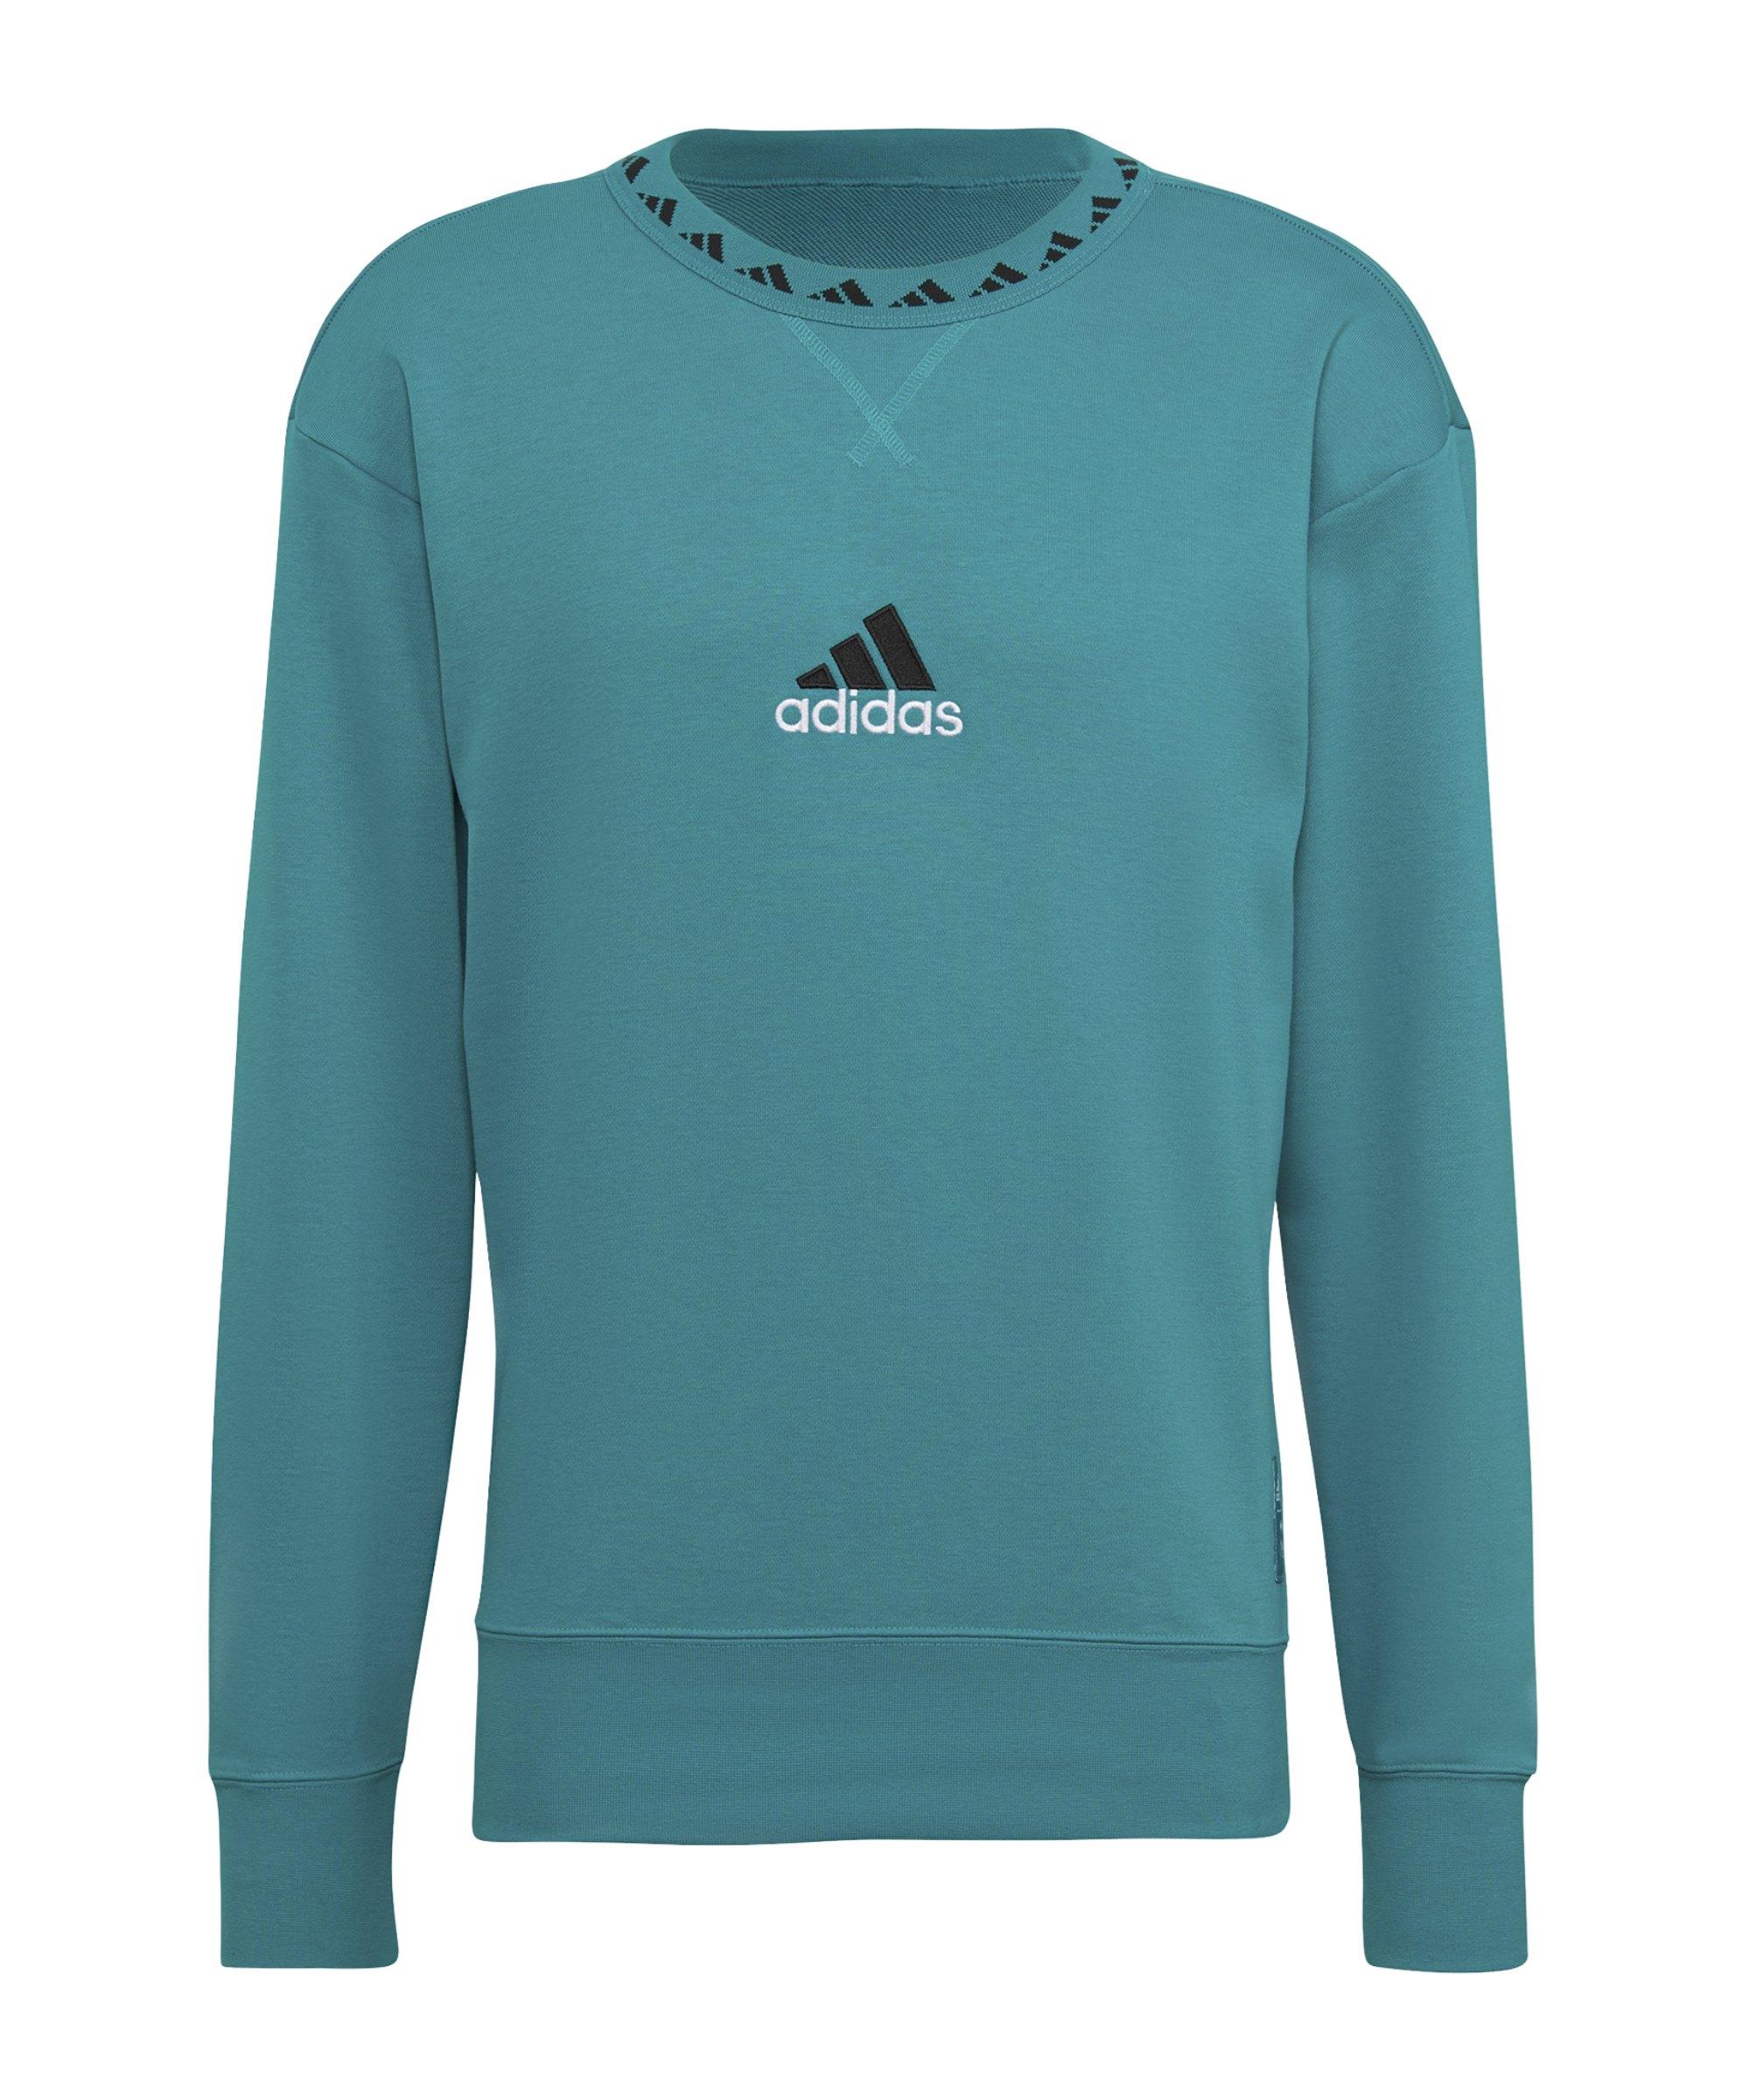 adidas Real Madrid Icon Sweatshirt Grün - gruen